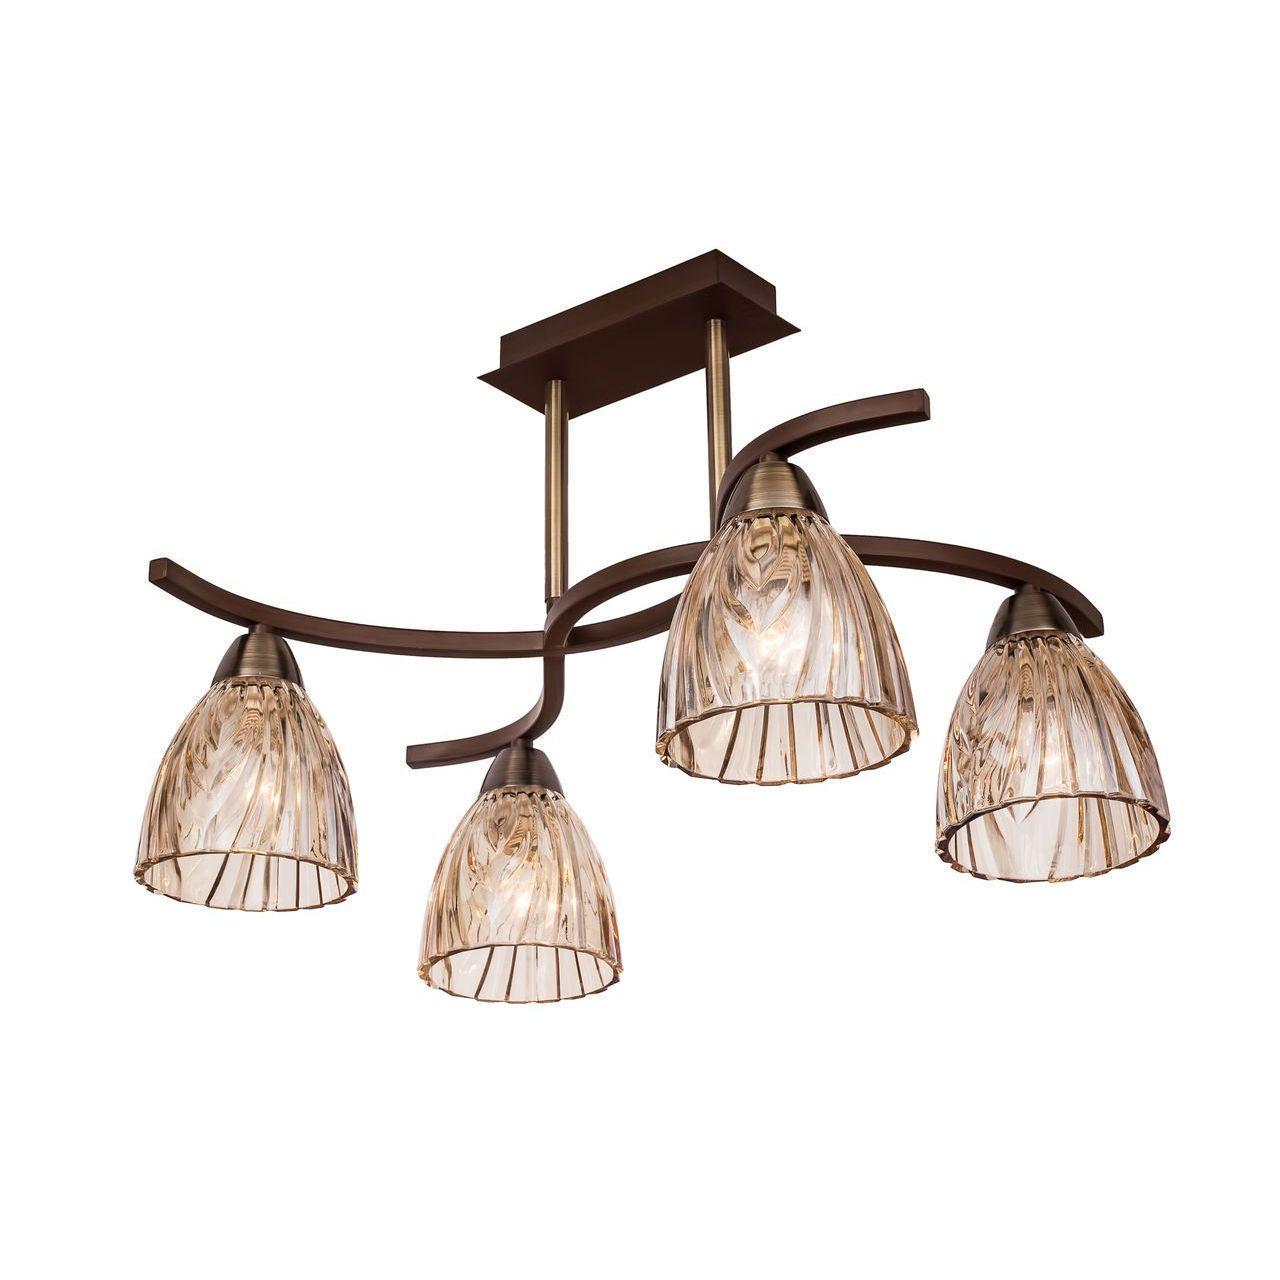 Люстра Silver Light Comfort 101.59.4 потолочная потолочная люстра silver light rhombus 201 54 12